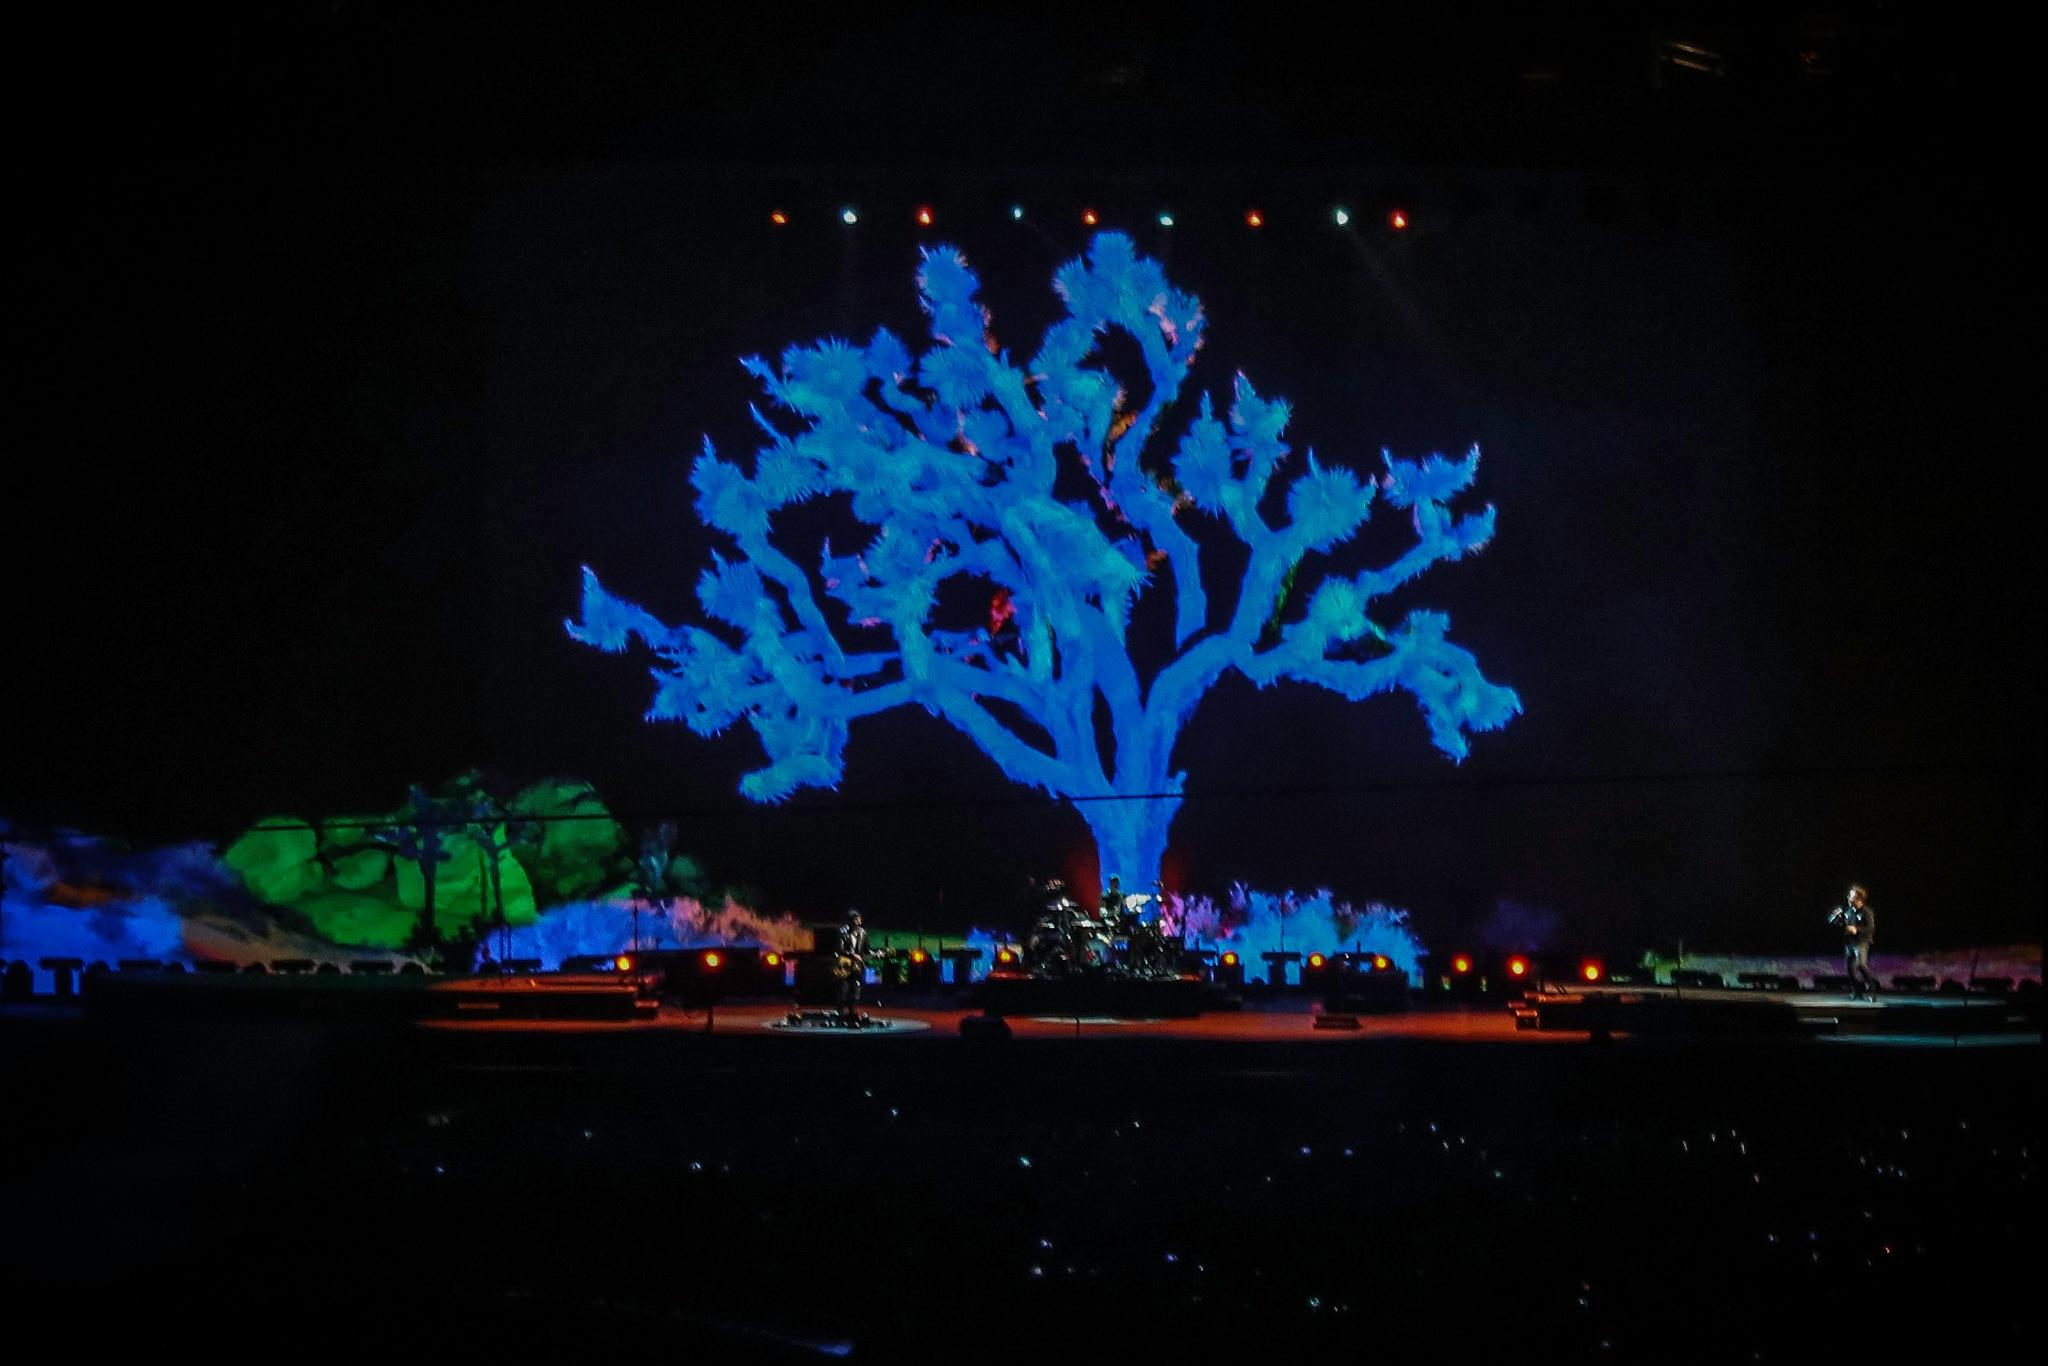 U2 (Joshua Tree Tour) by Mark Hootman